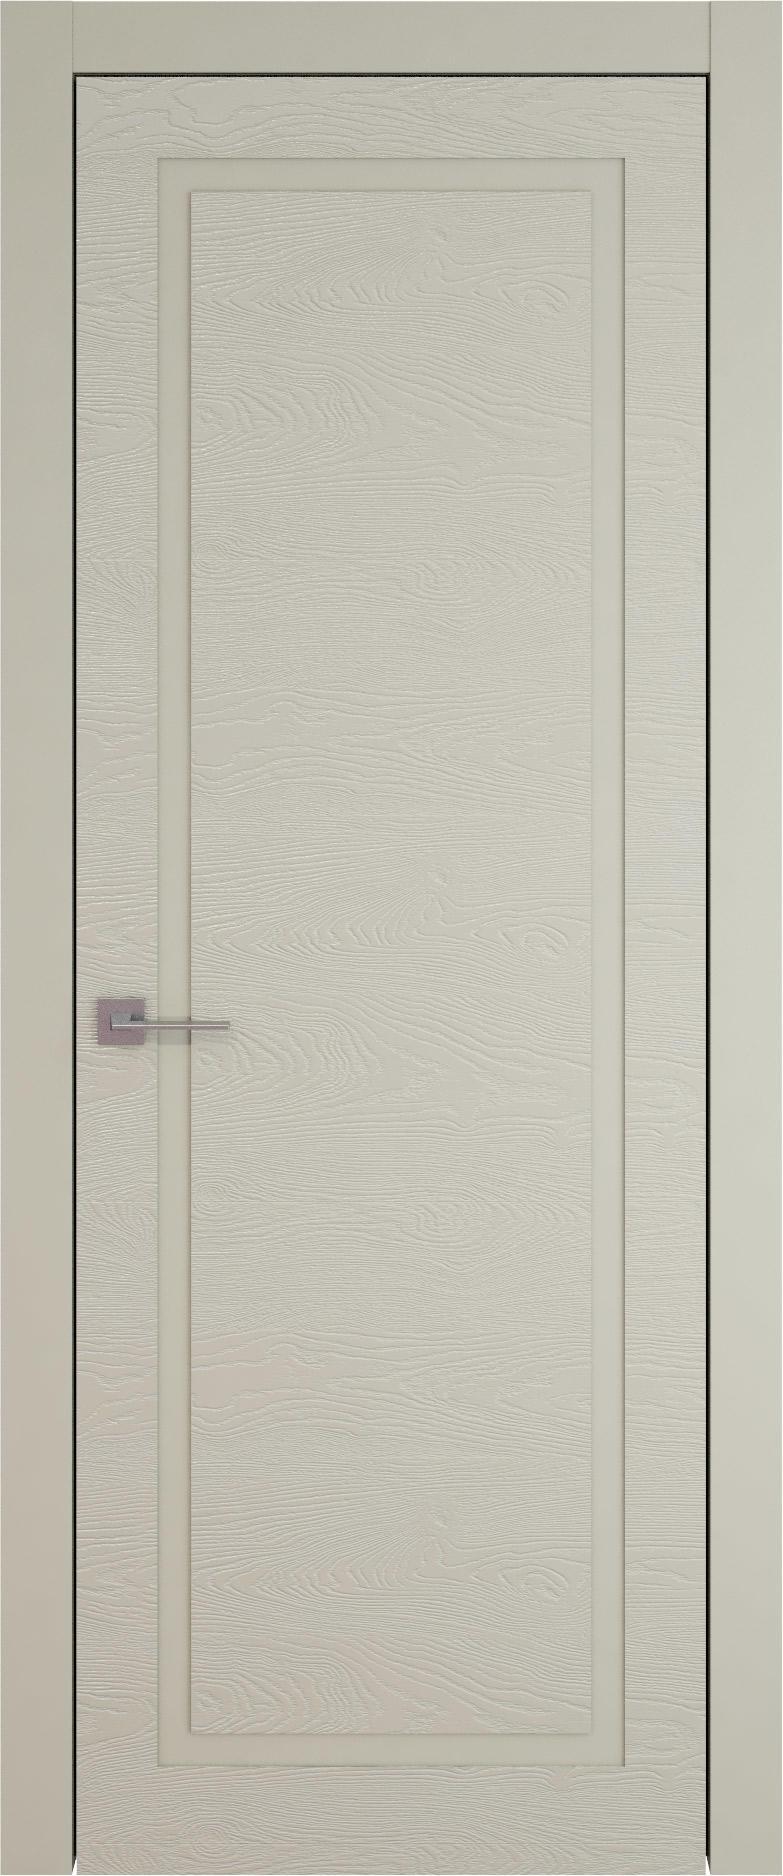 Tivoli Д-5 цвет - Серо-оливковая эмаль по шпону (RAL 7032) Без стекла (ДГ)